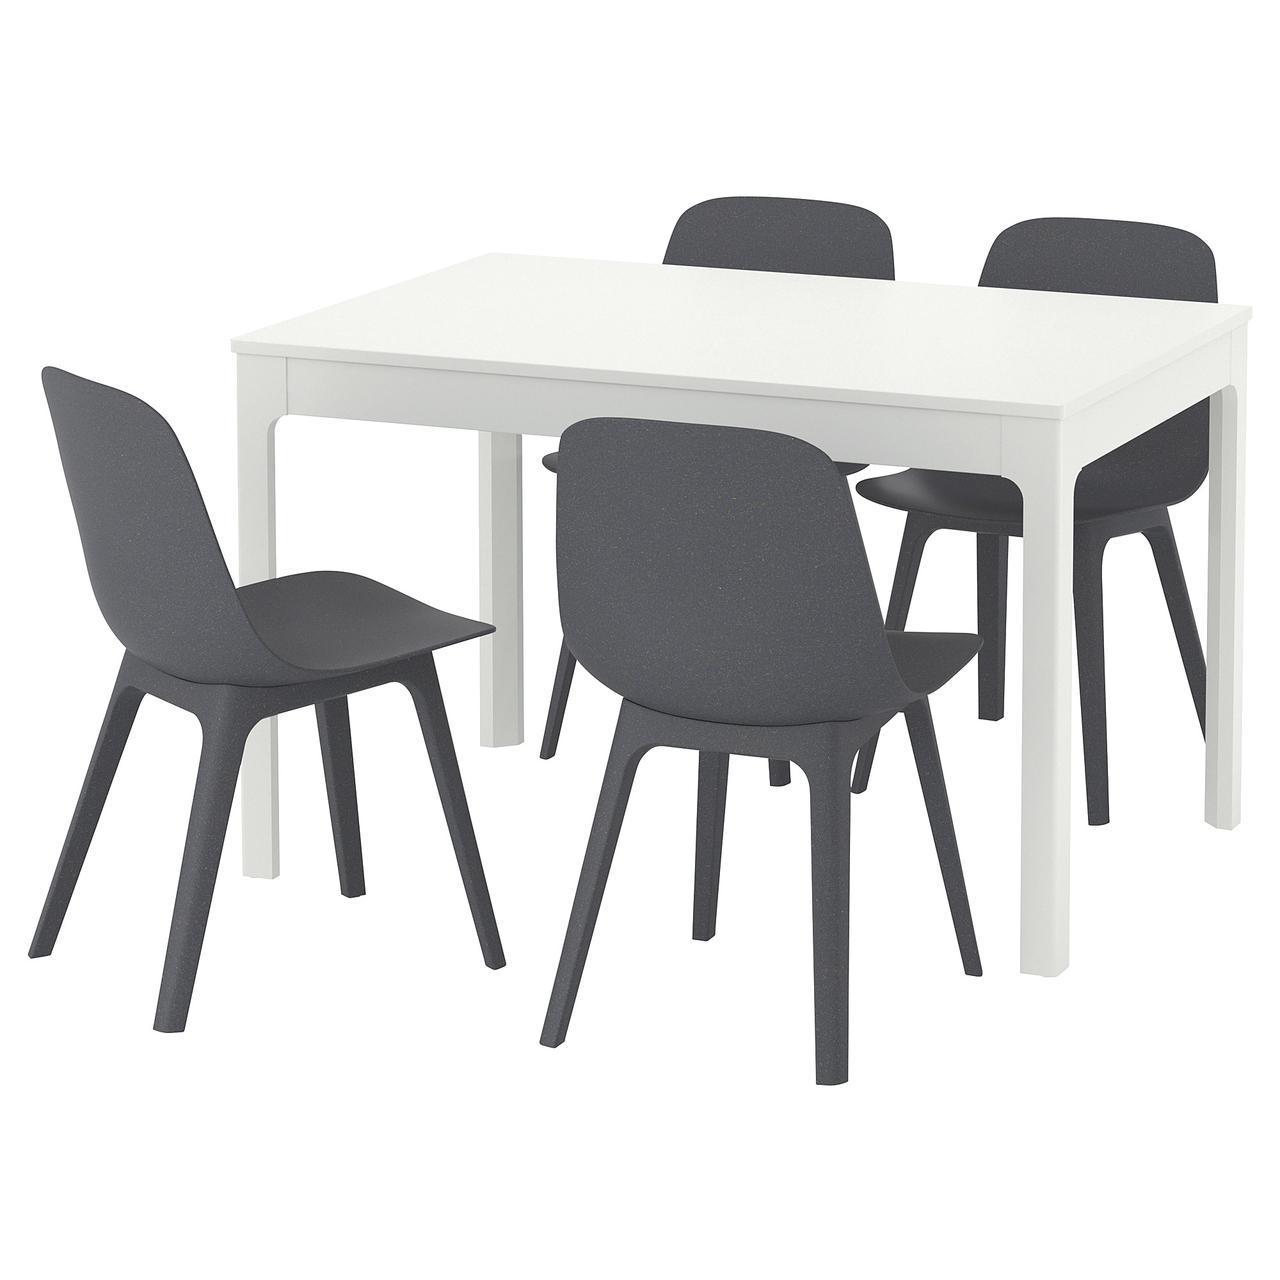 IKEA EKEDALEN / ODGER (692.213.44) Стол и 4 стула, синий